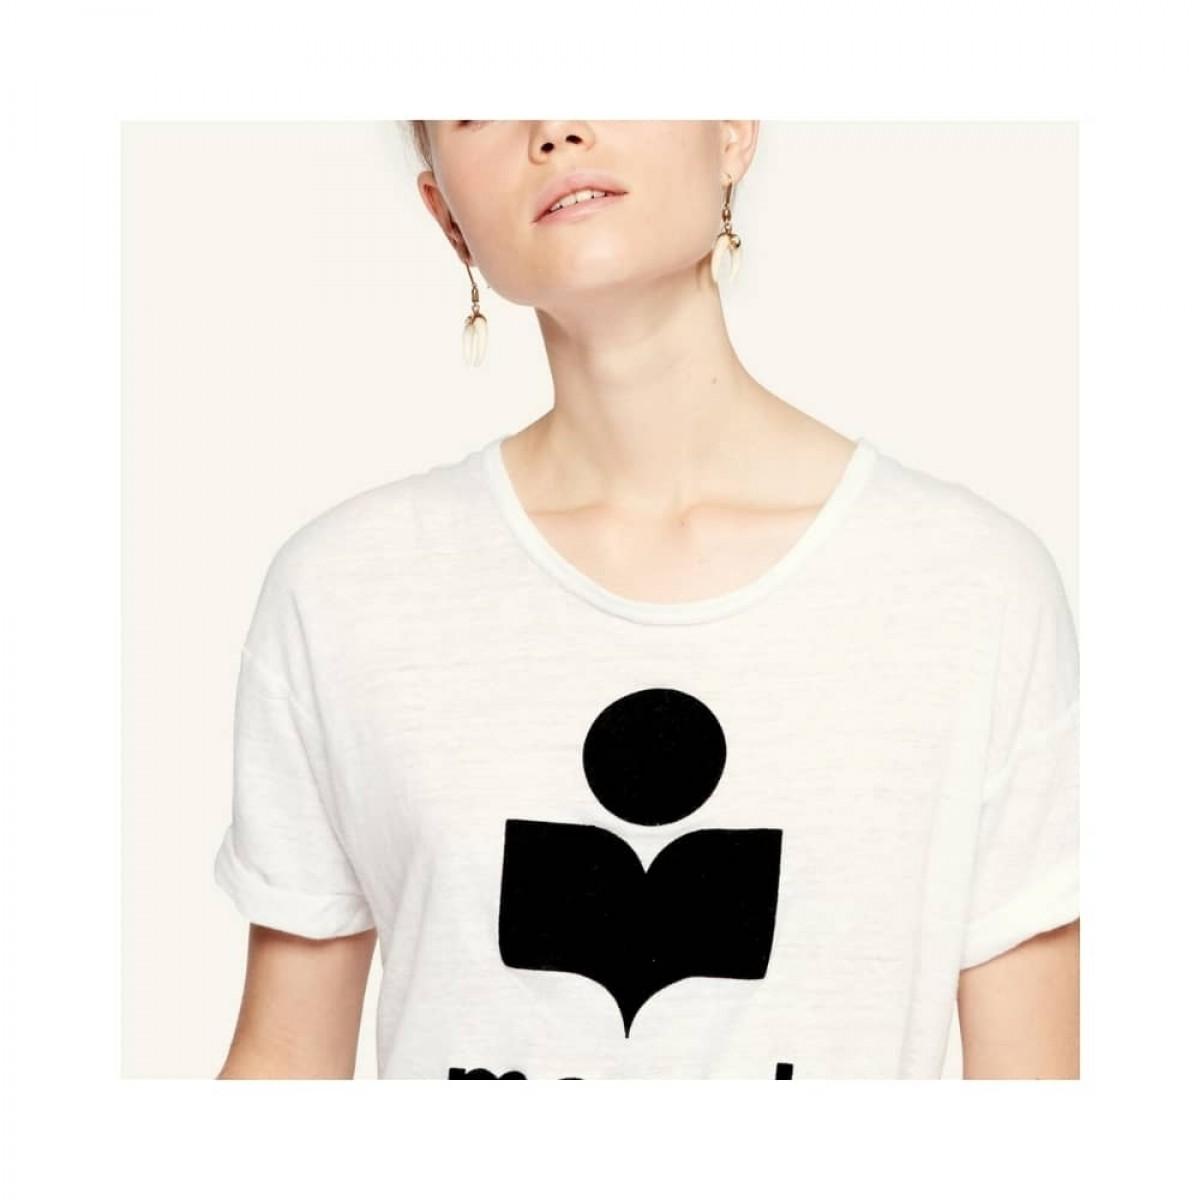 koldi t-shirt - white - model logo detalje